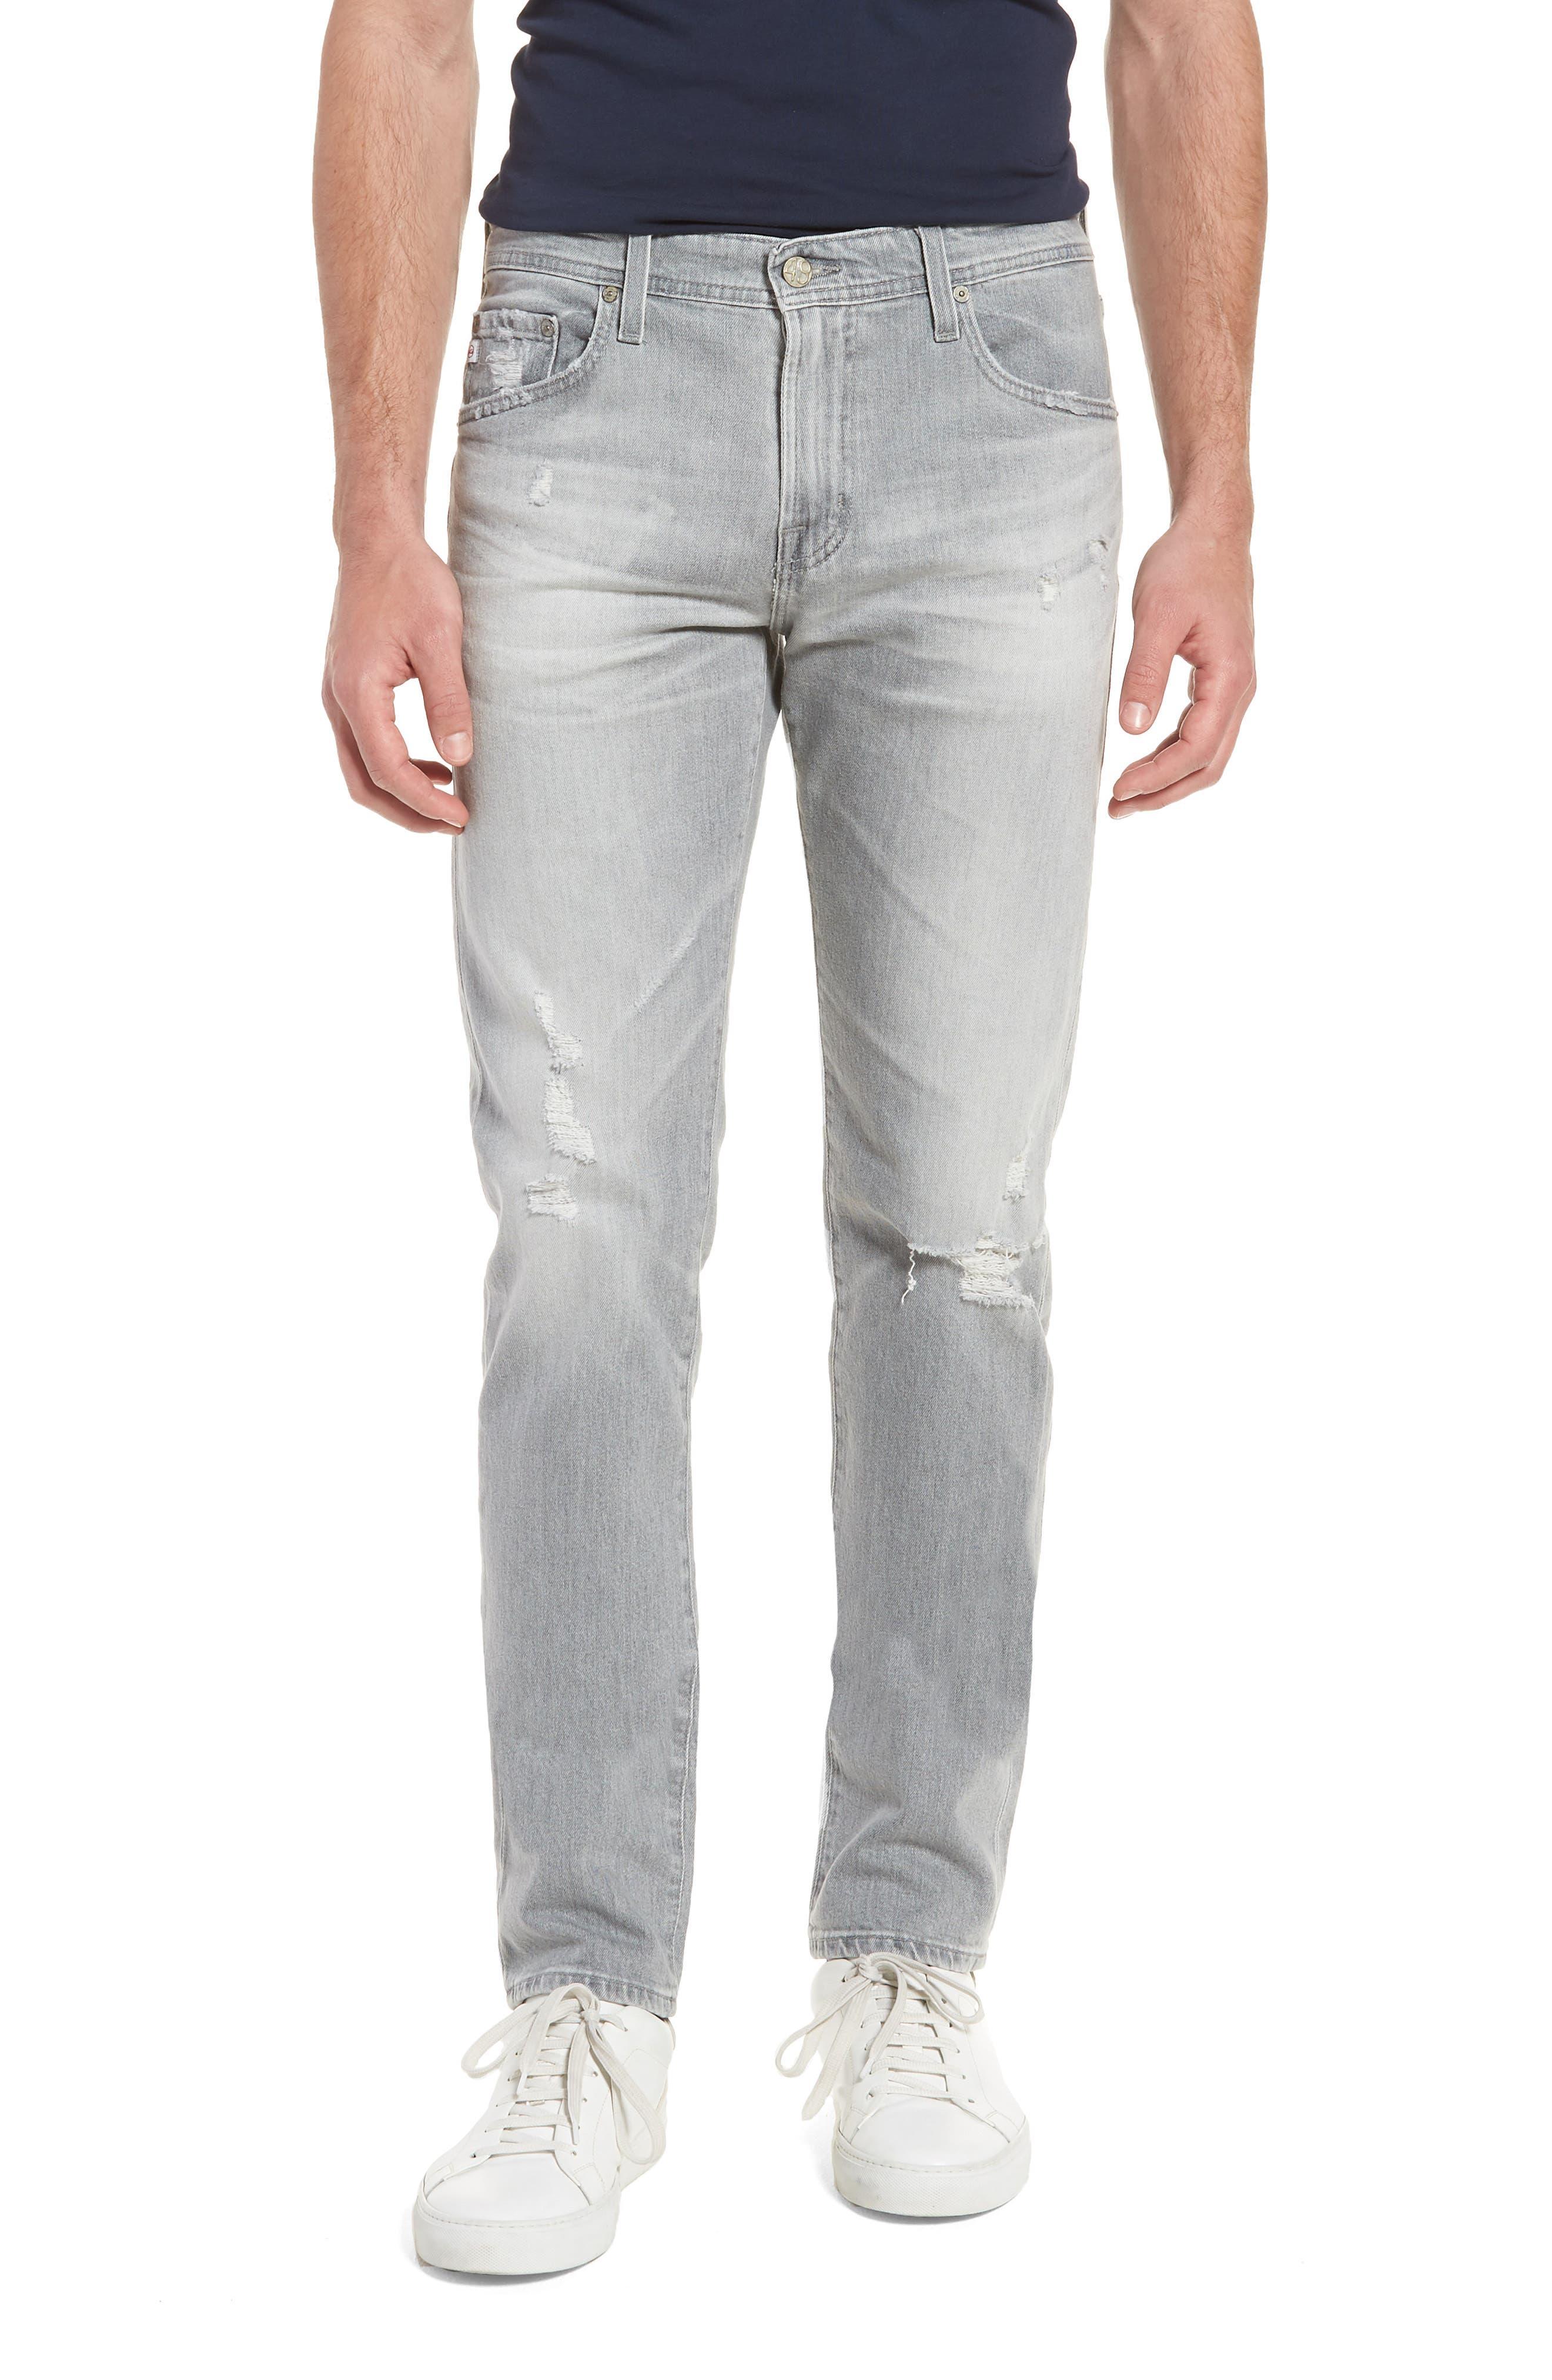 Tellis Slim Fit Jeans,                             Main thumbnail 1, color,                             21 Years Sketch